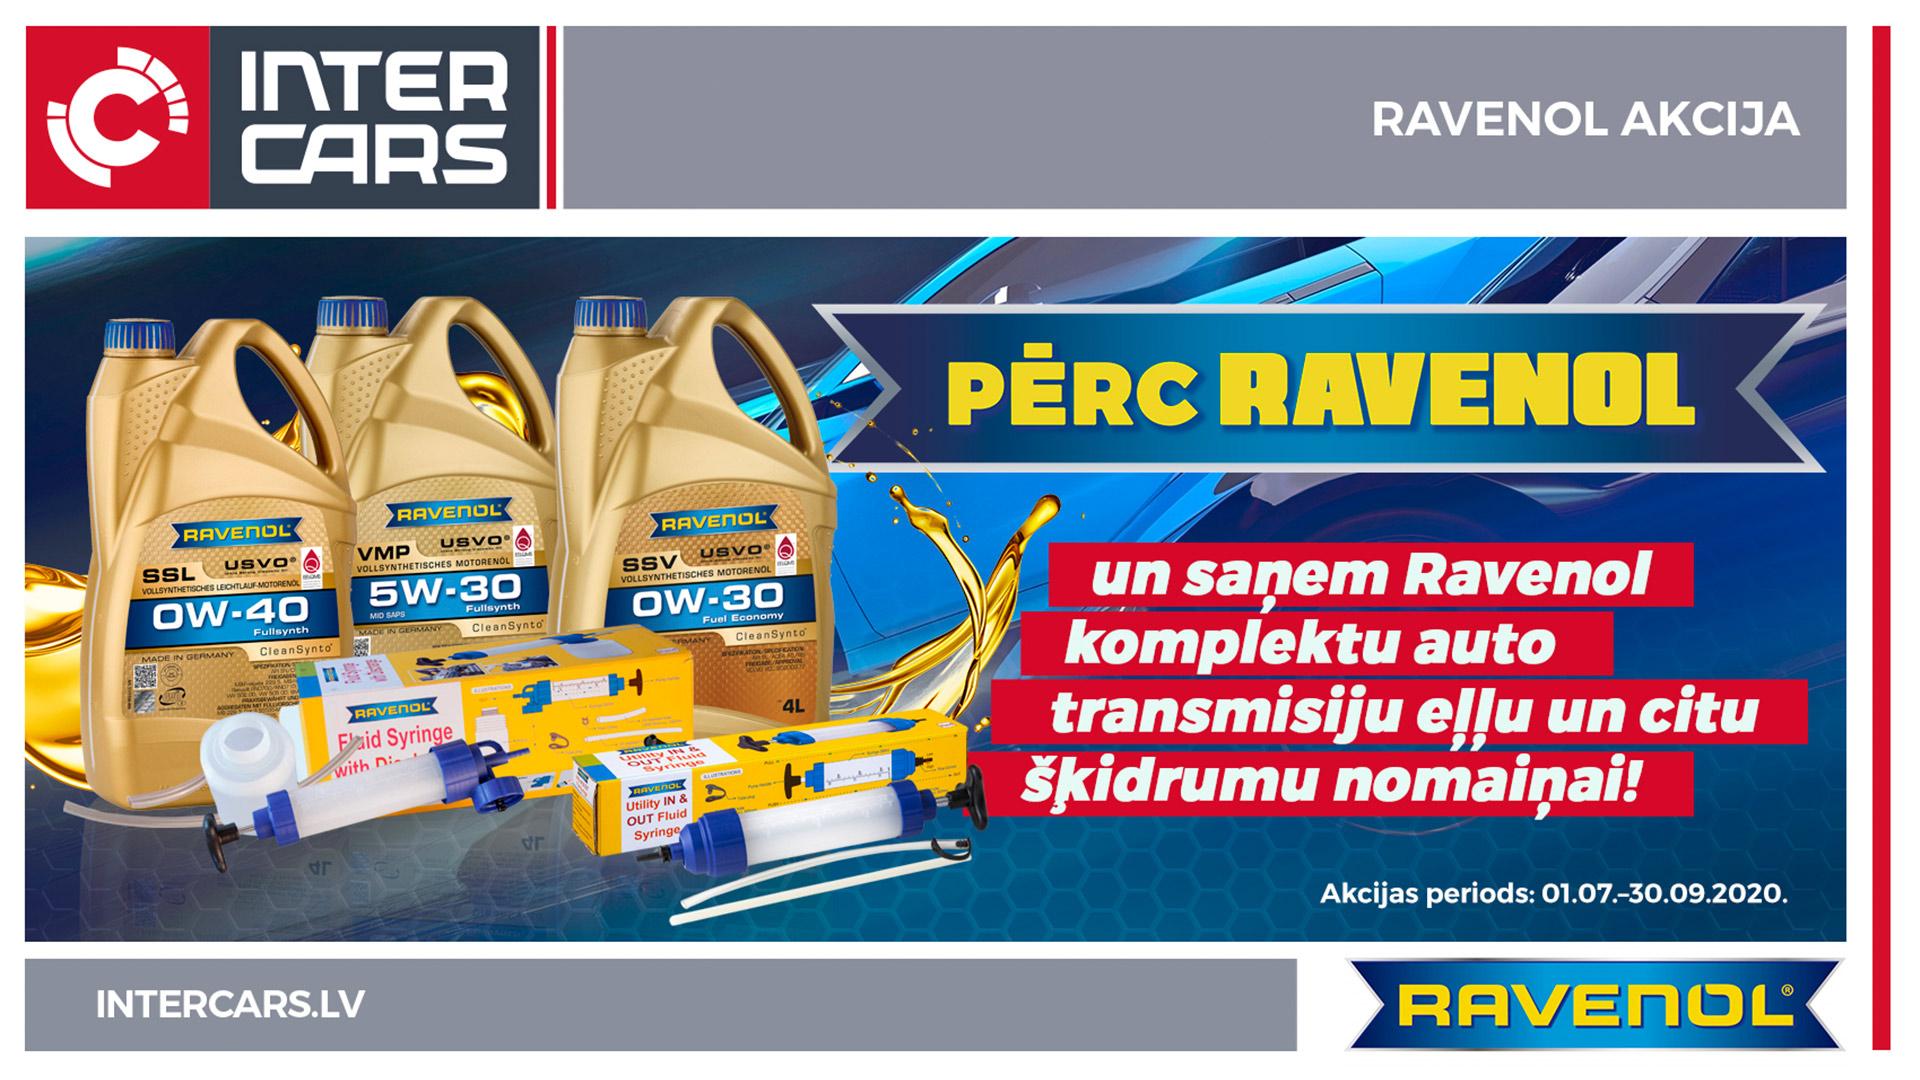 RAVENOL-akcija-jul2020-CRM-B.jpg